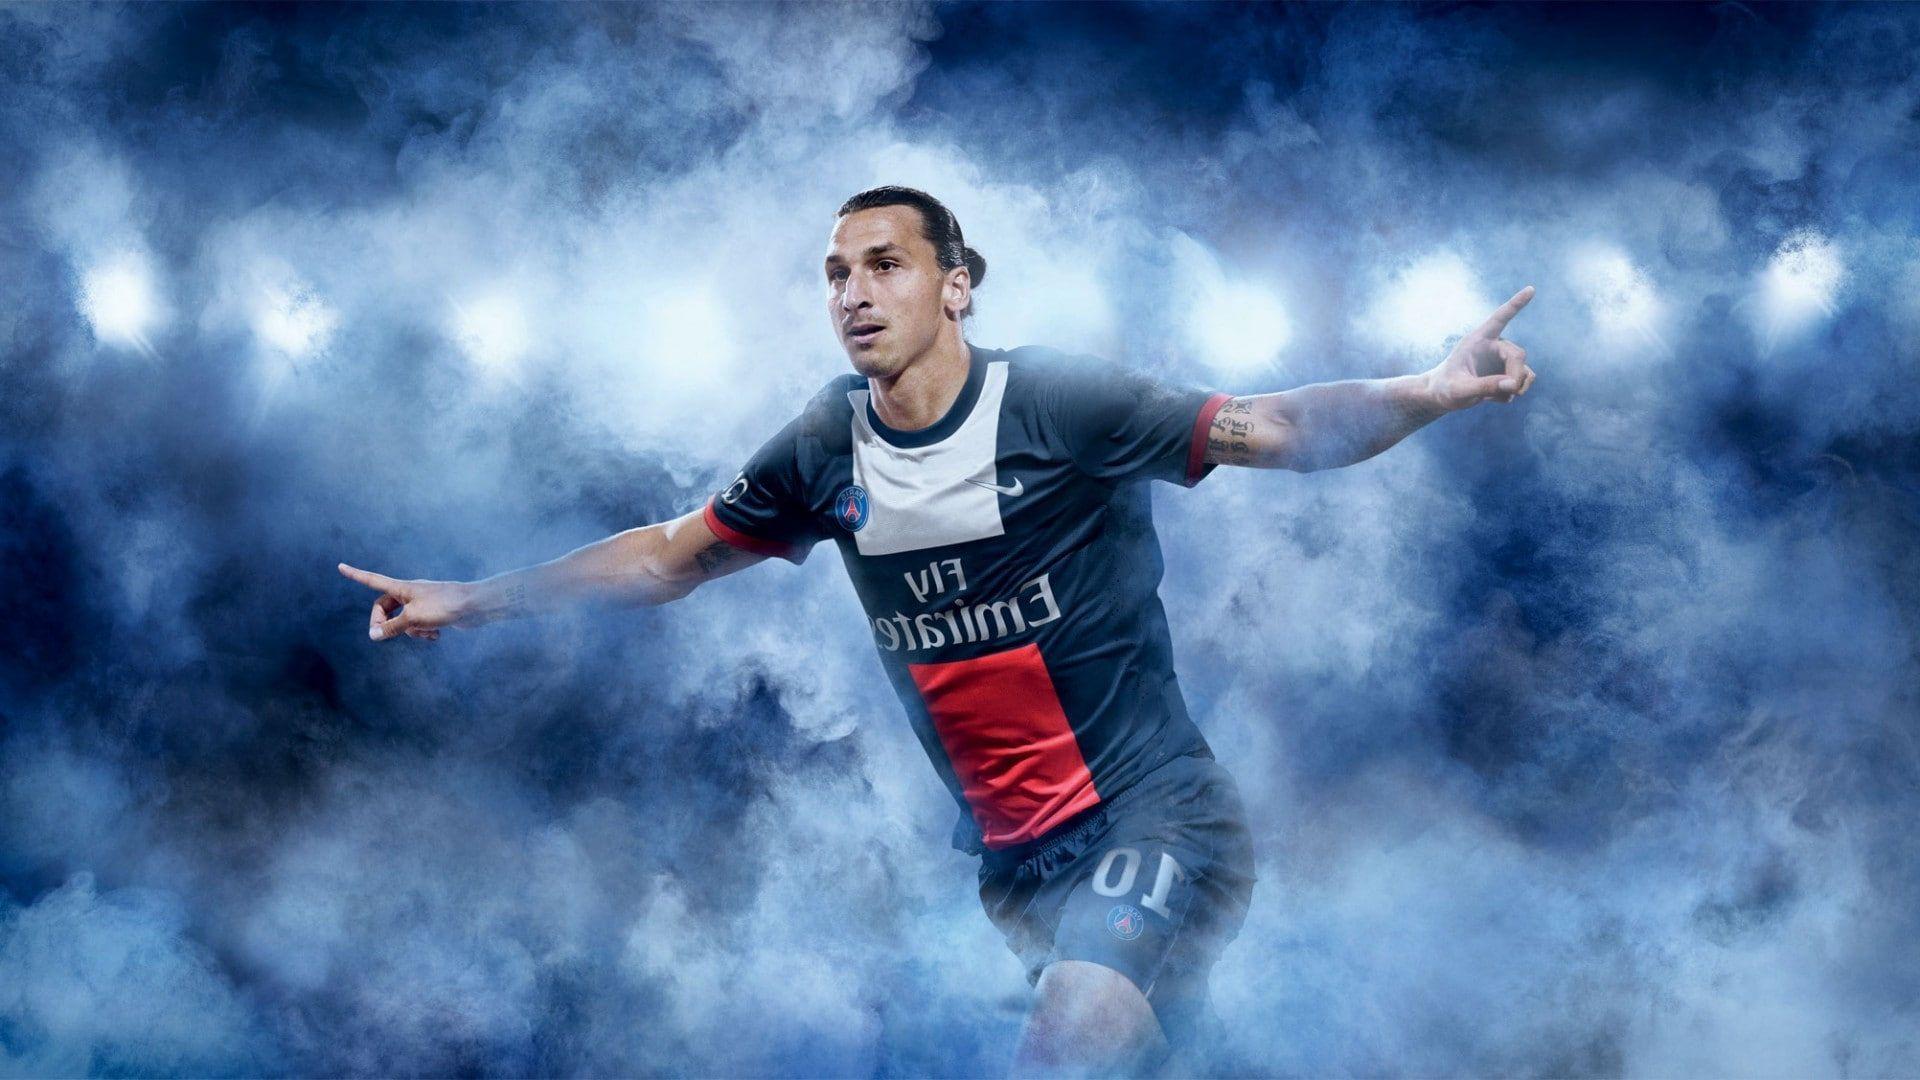 Men Zlatan Ibrahimovic 1080p Wallpaper Hdwallpaper Desktop Zlatan Ibrahimovic Good Soccer Players Paris Saint Germain